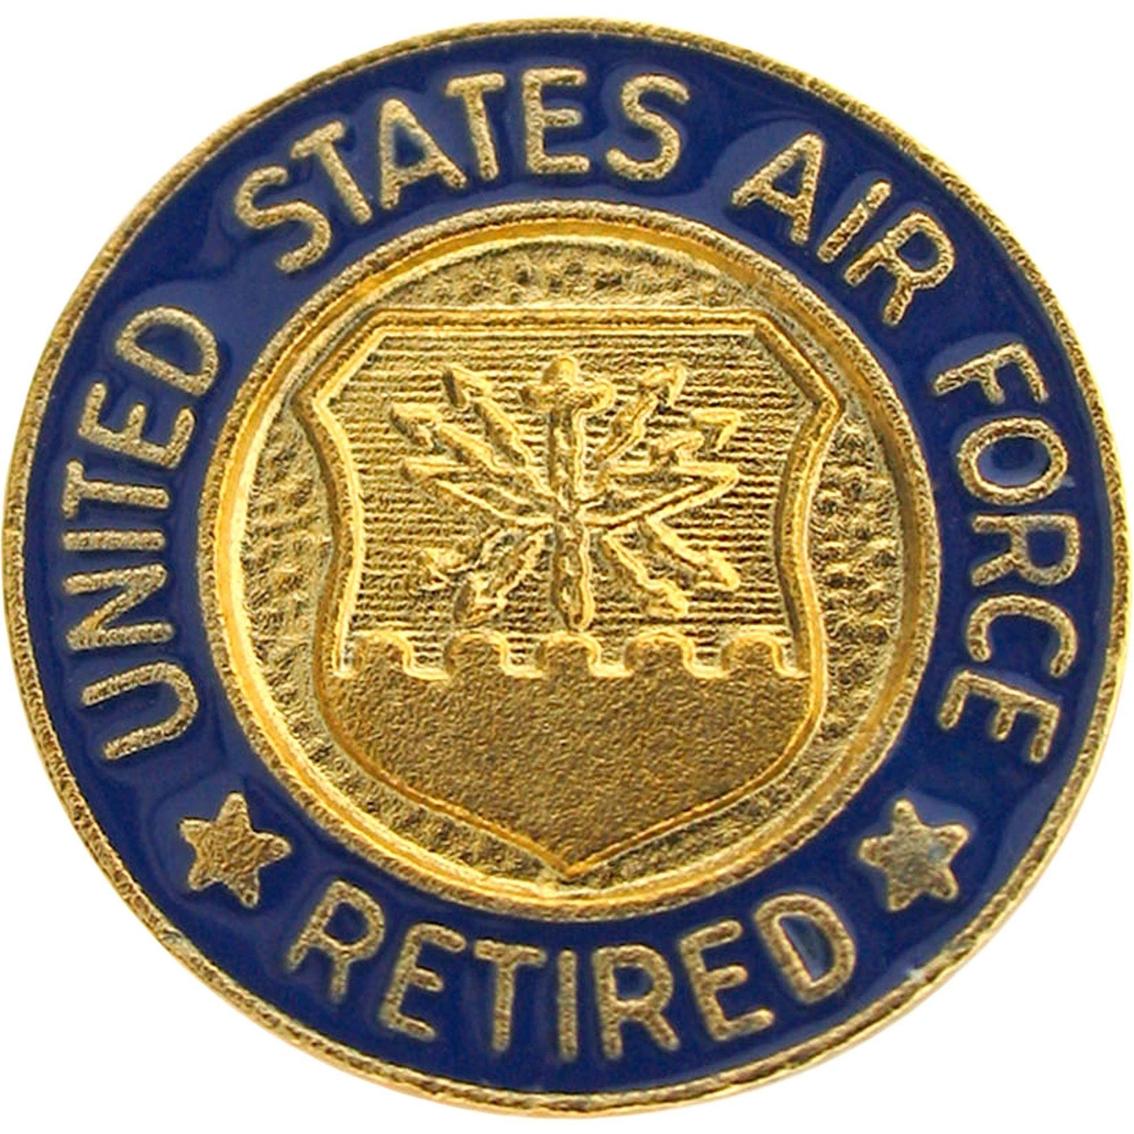 Air Force Lapel Button Retired Personnel Wear | Veterans & Retirees ...